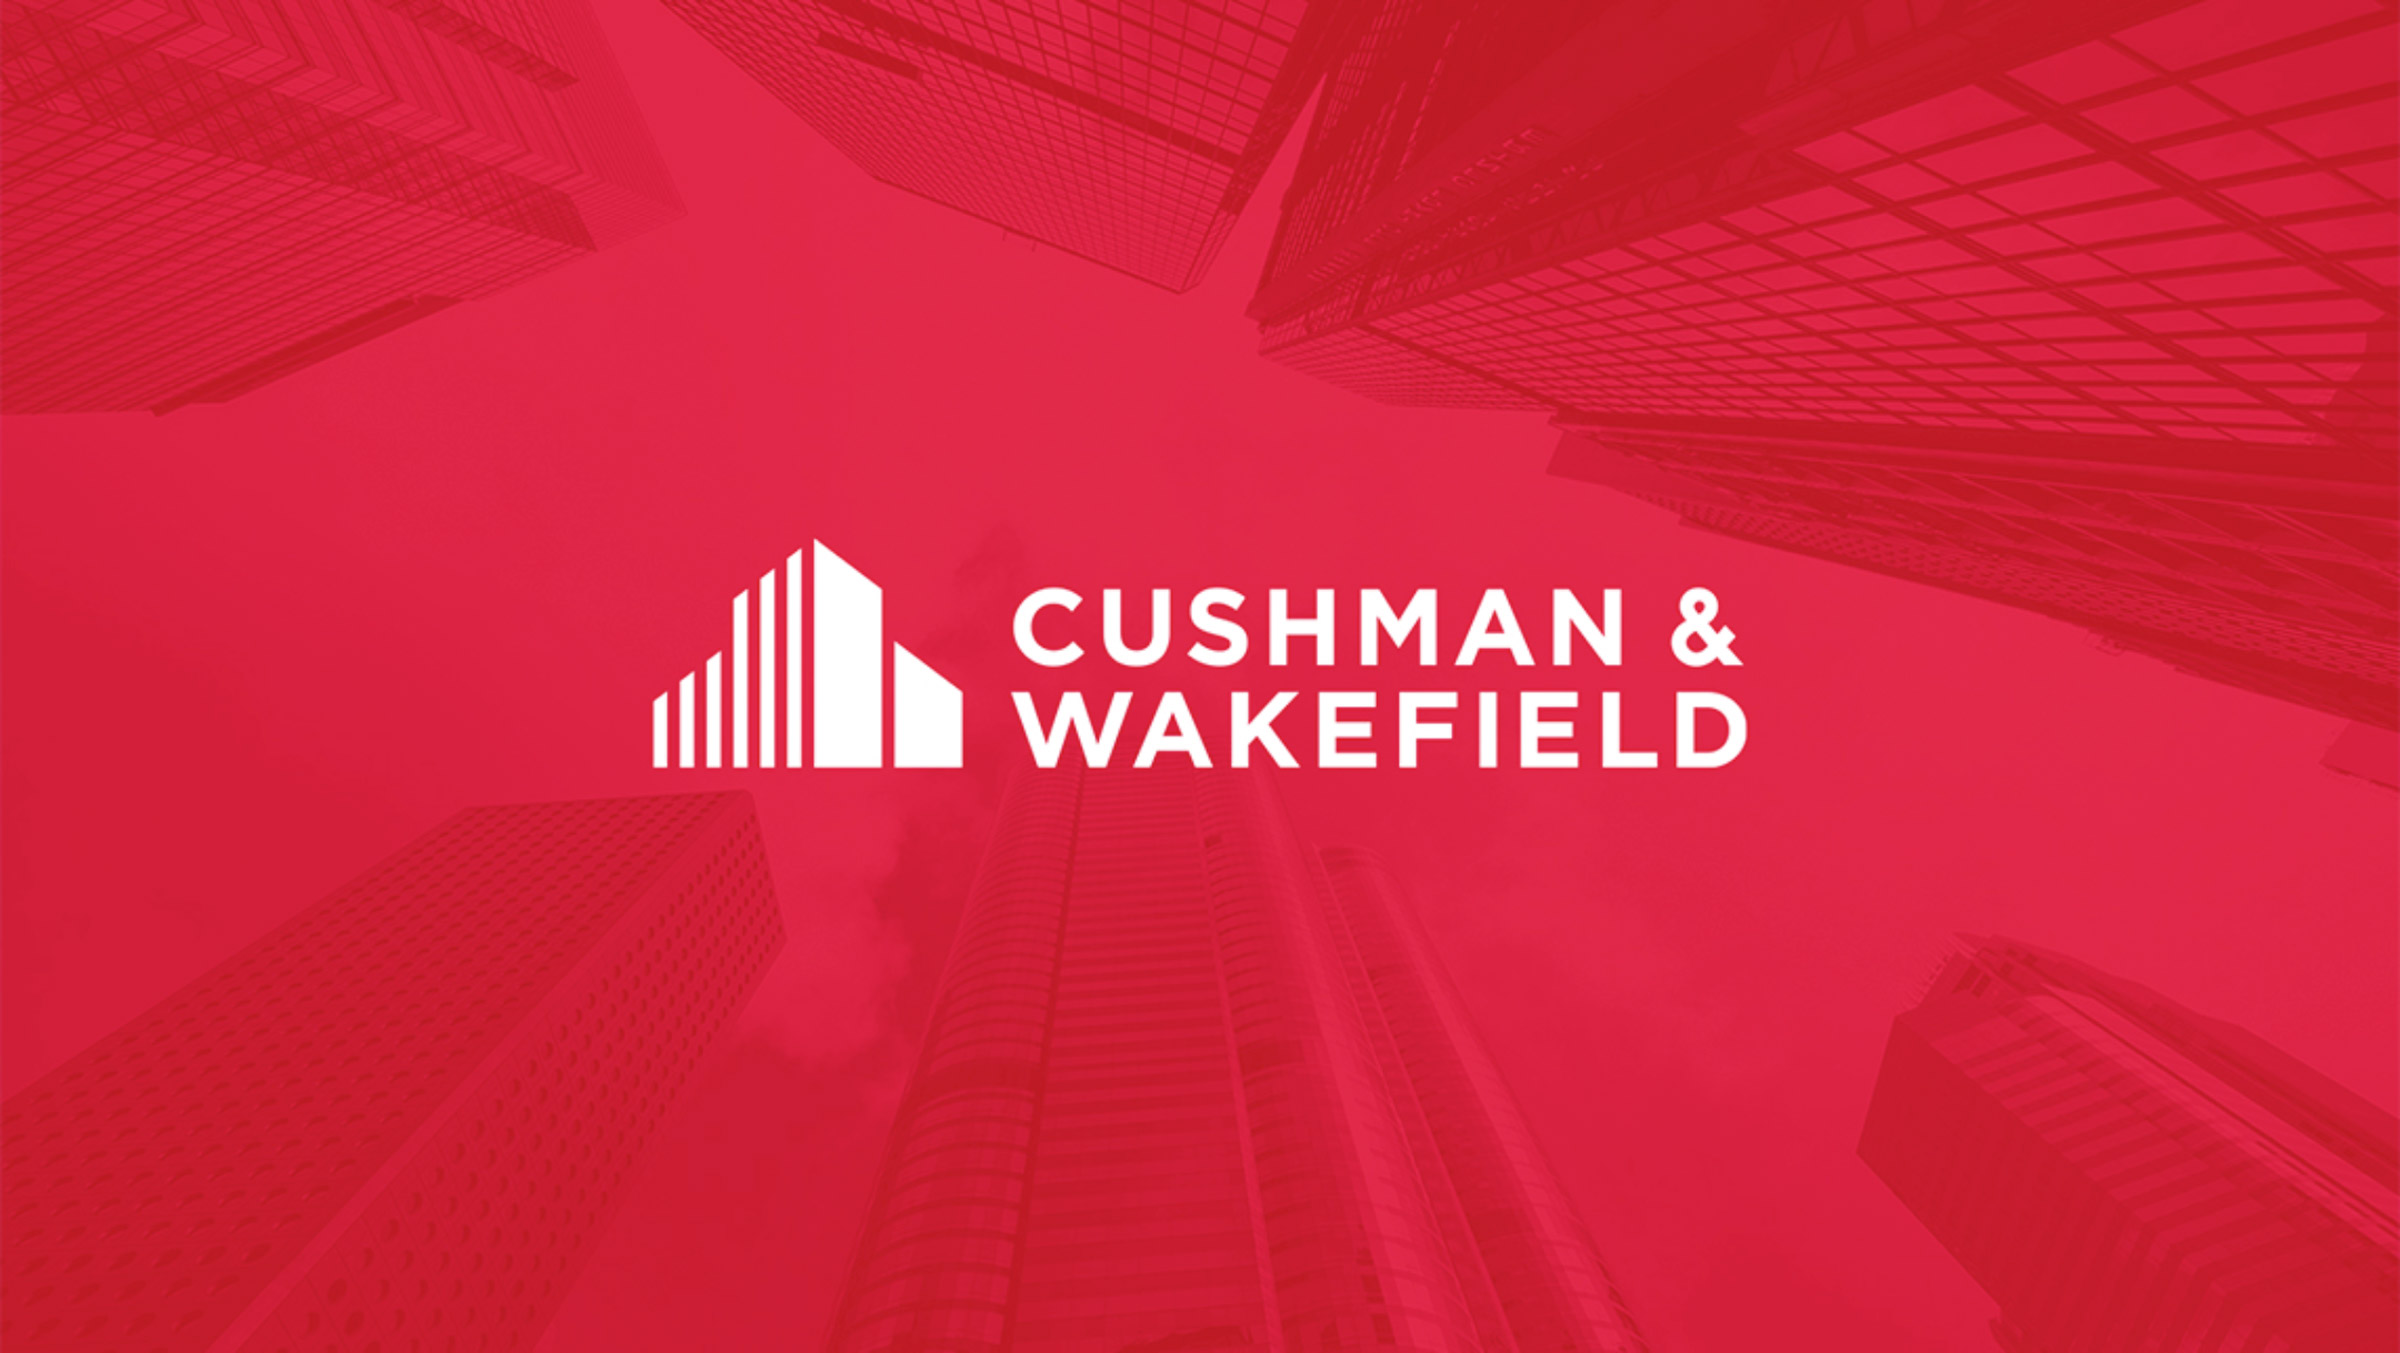 Cushman & Wakefield Brand Identity.